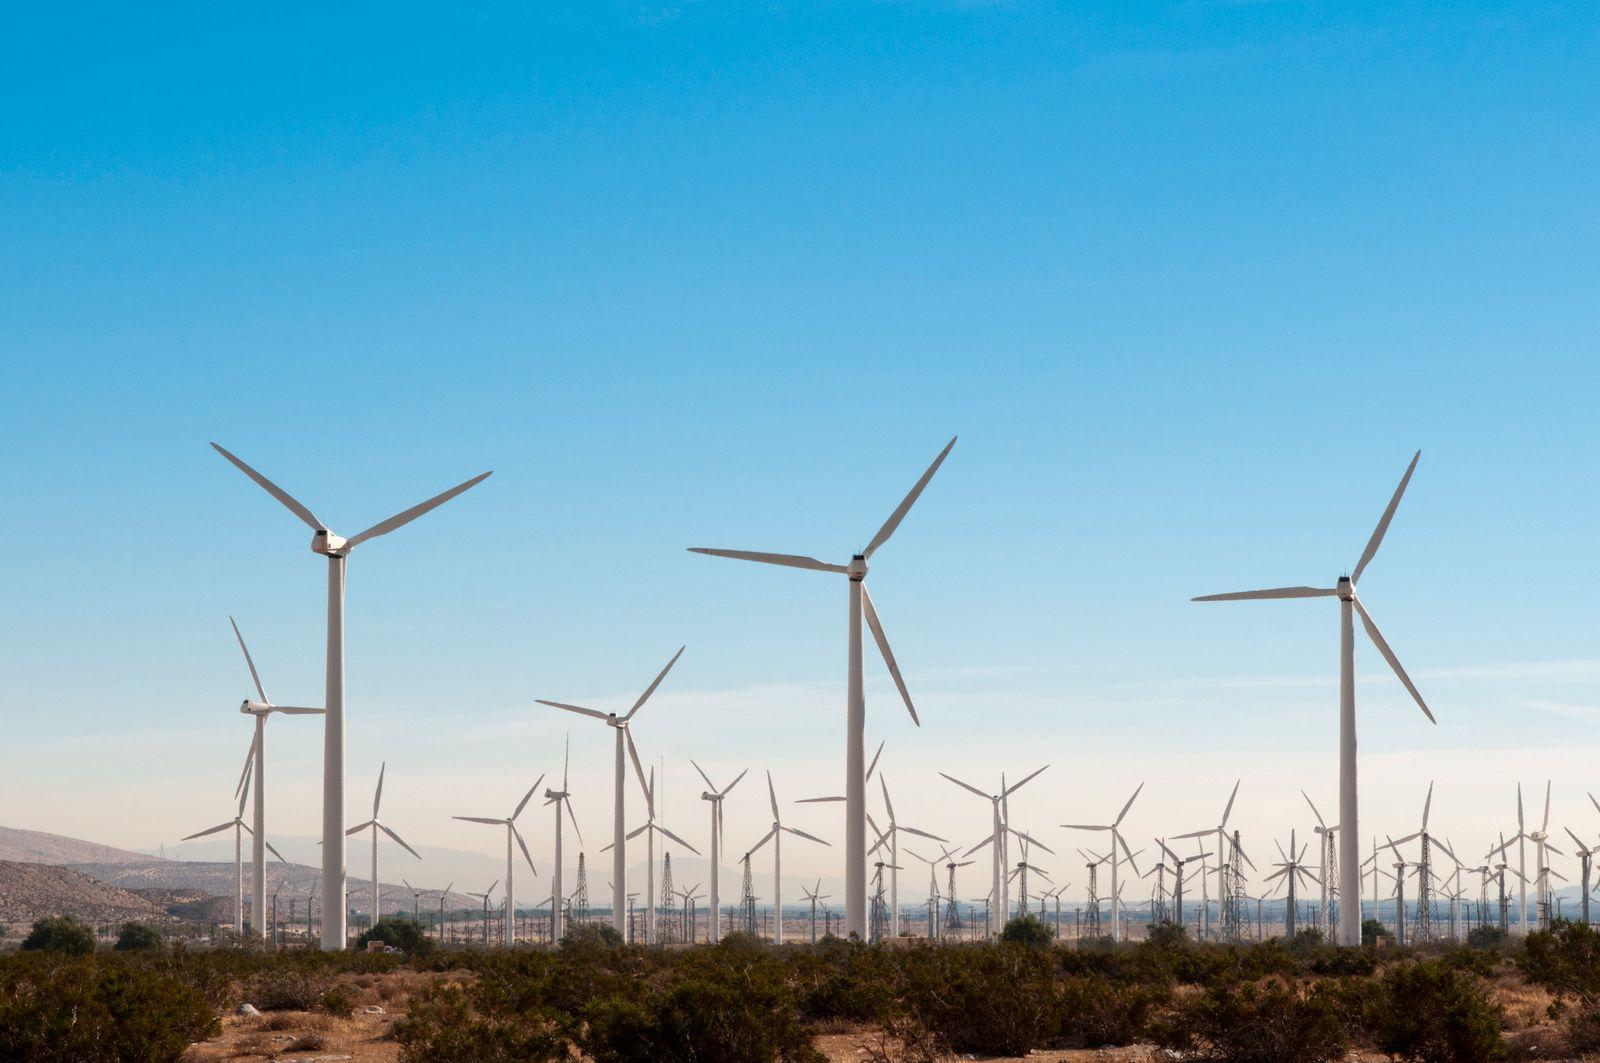 USA, California, Palm Springs, Wind turbines